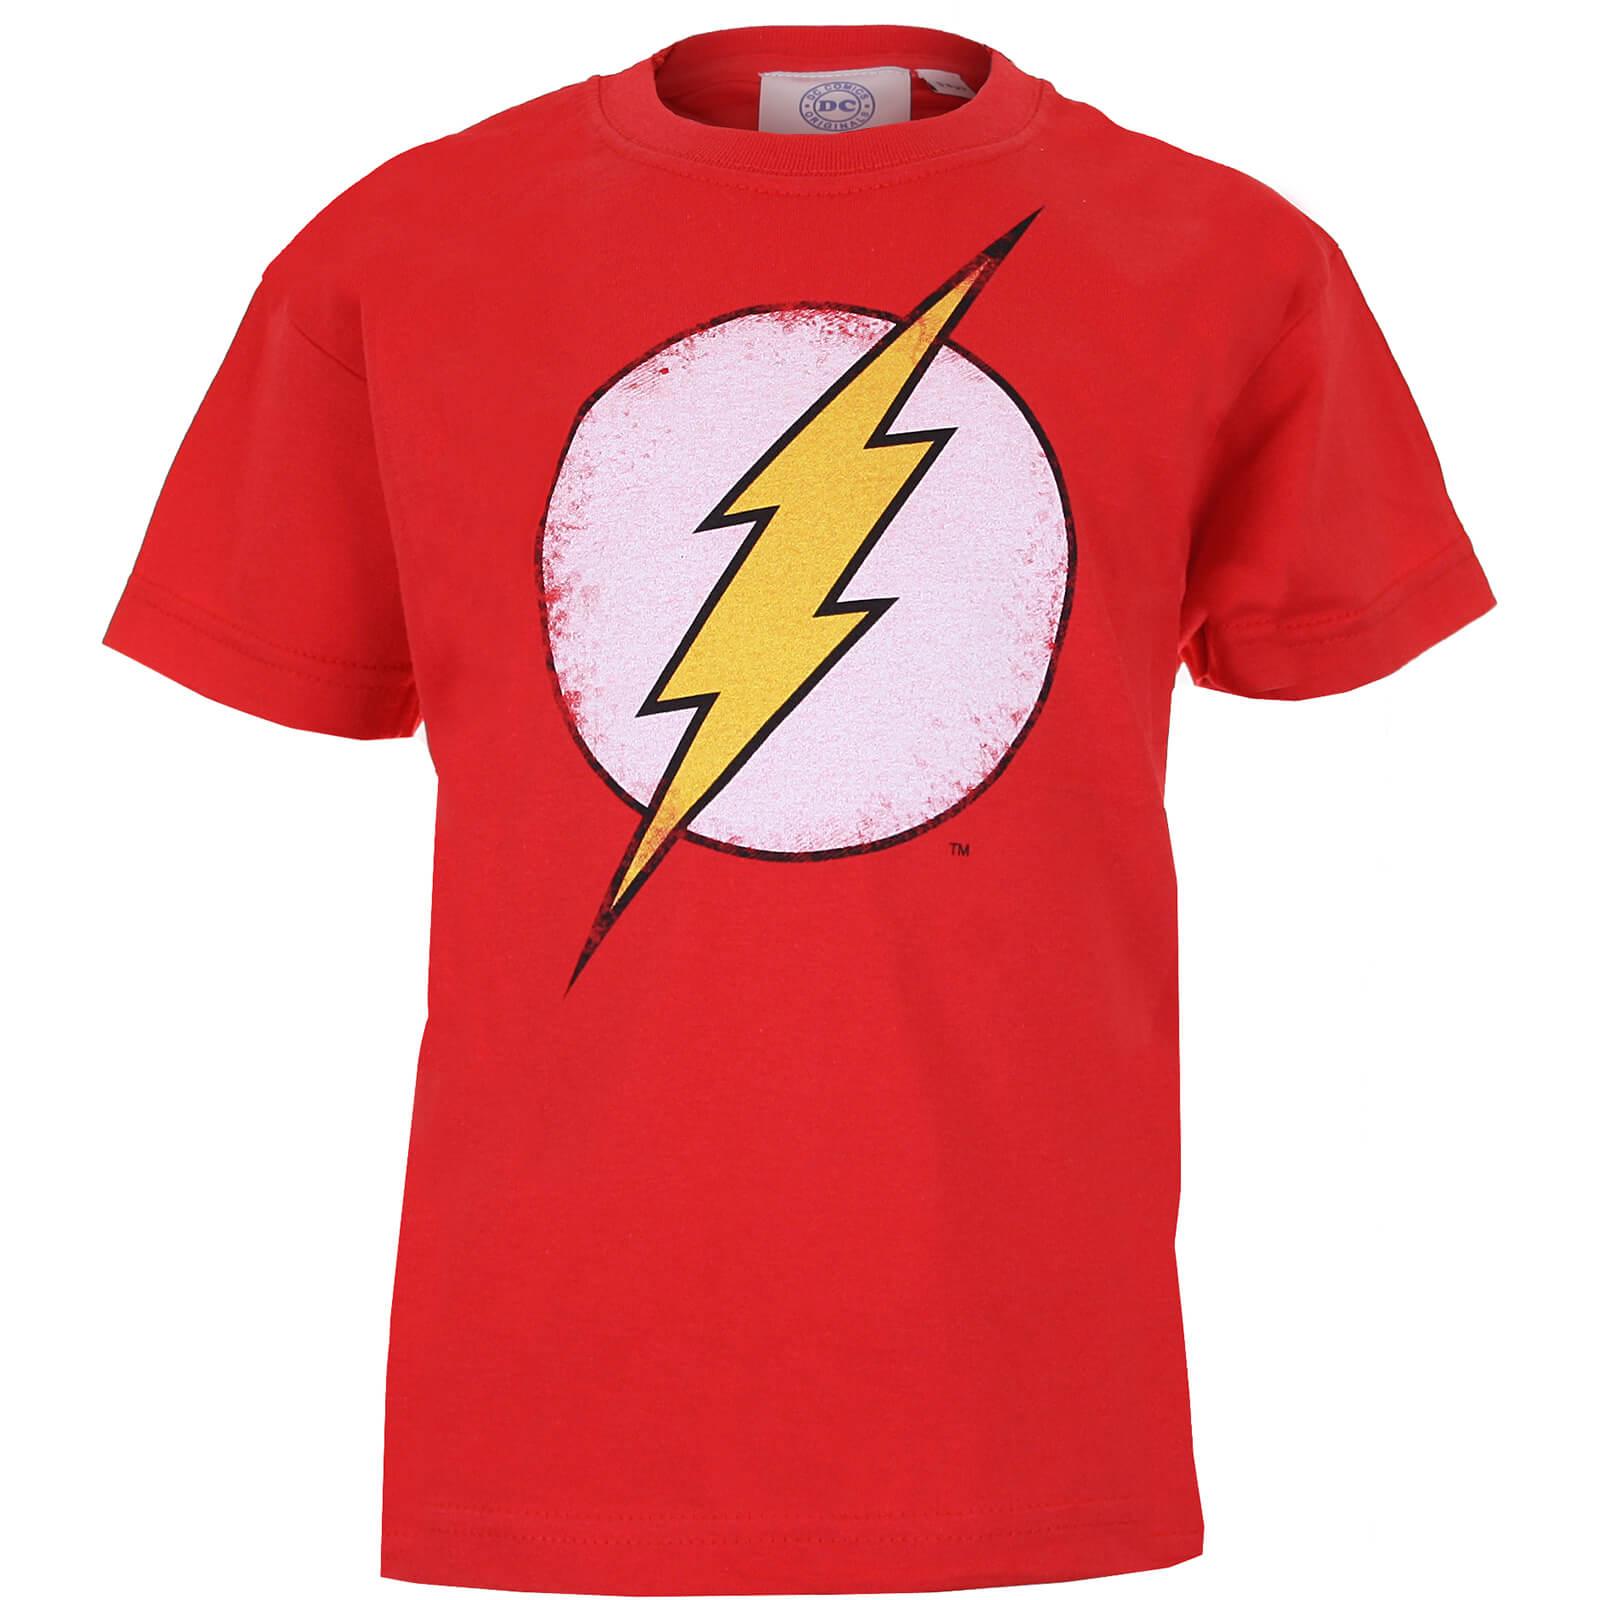 0101e5d9a Camiseta DC Comics Flash Logo - Niño - Rojo Merchandise